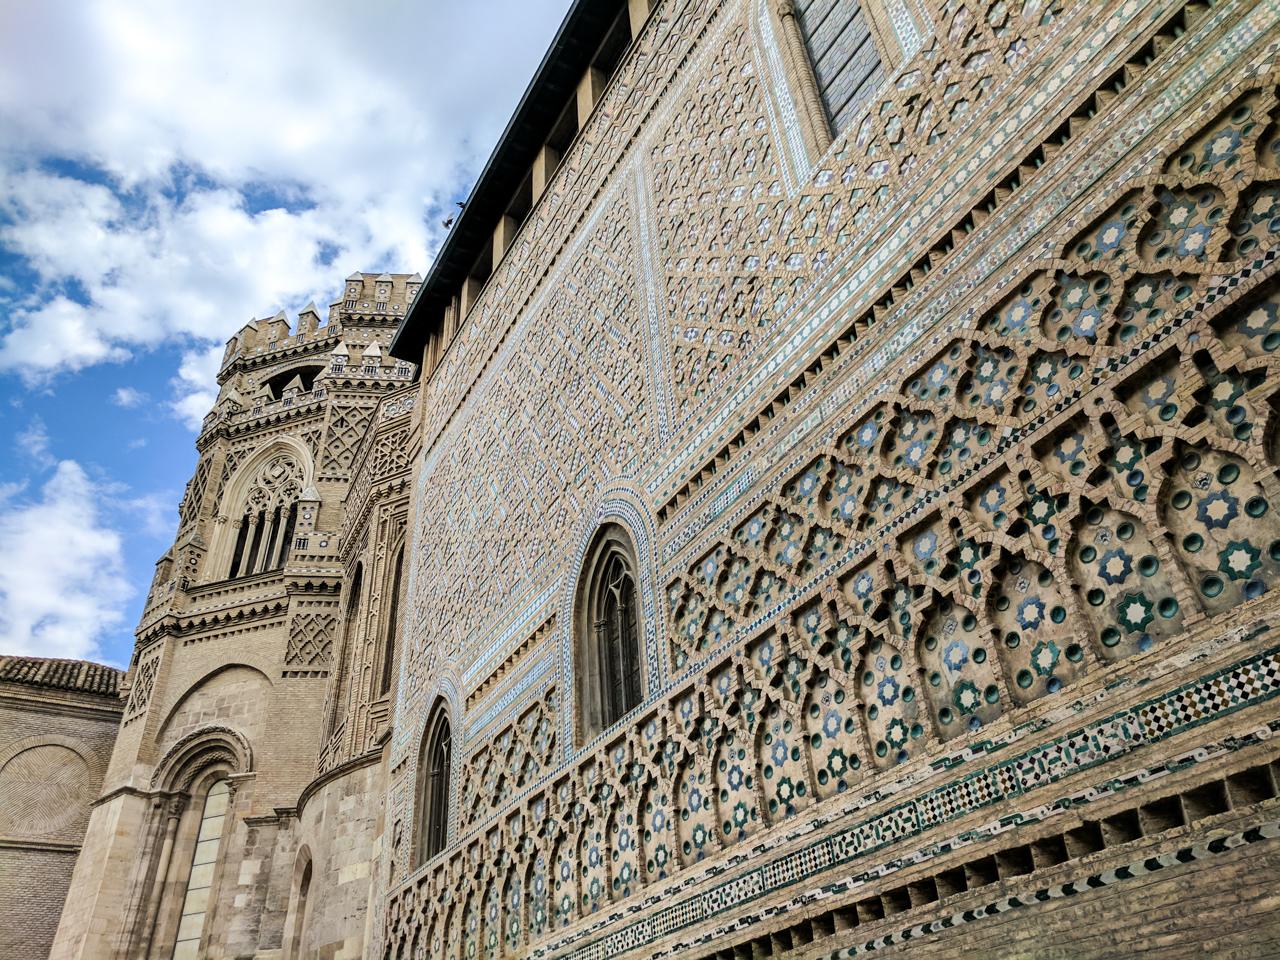 Cathedral of the Savior of Zaragoza